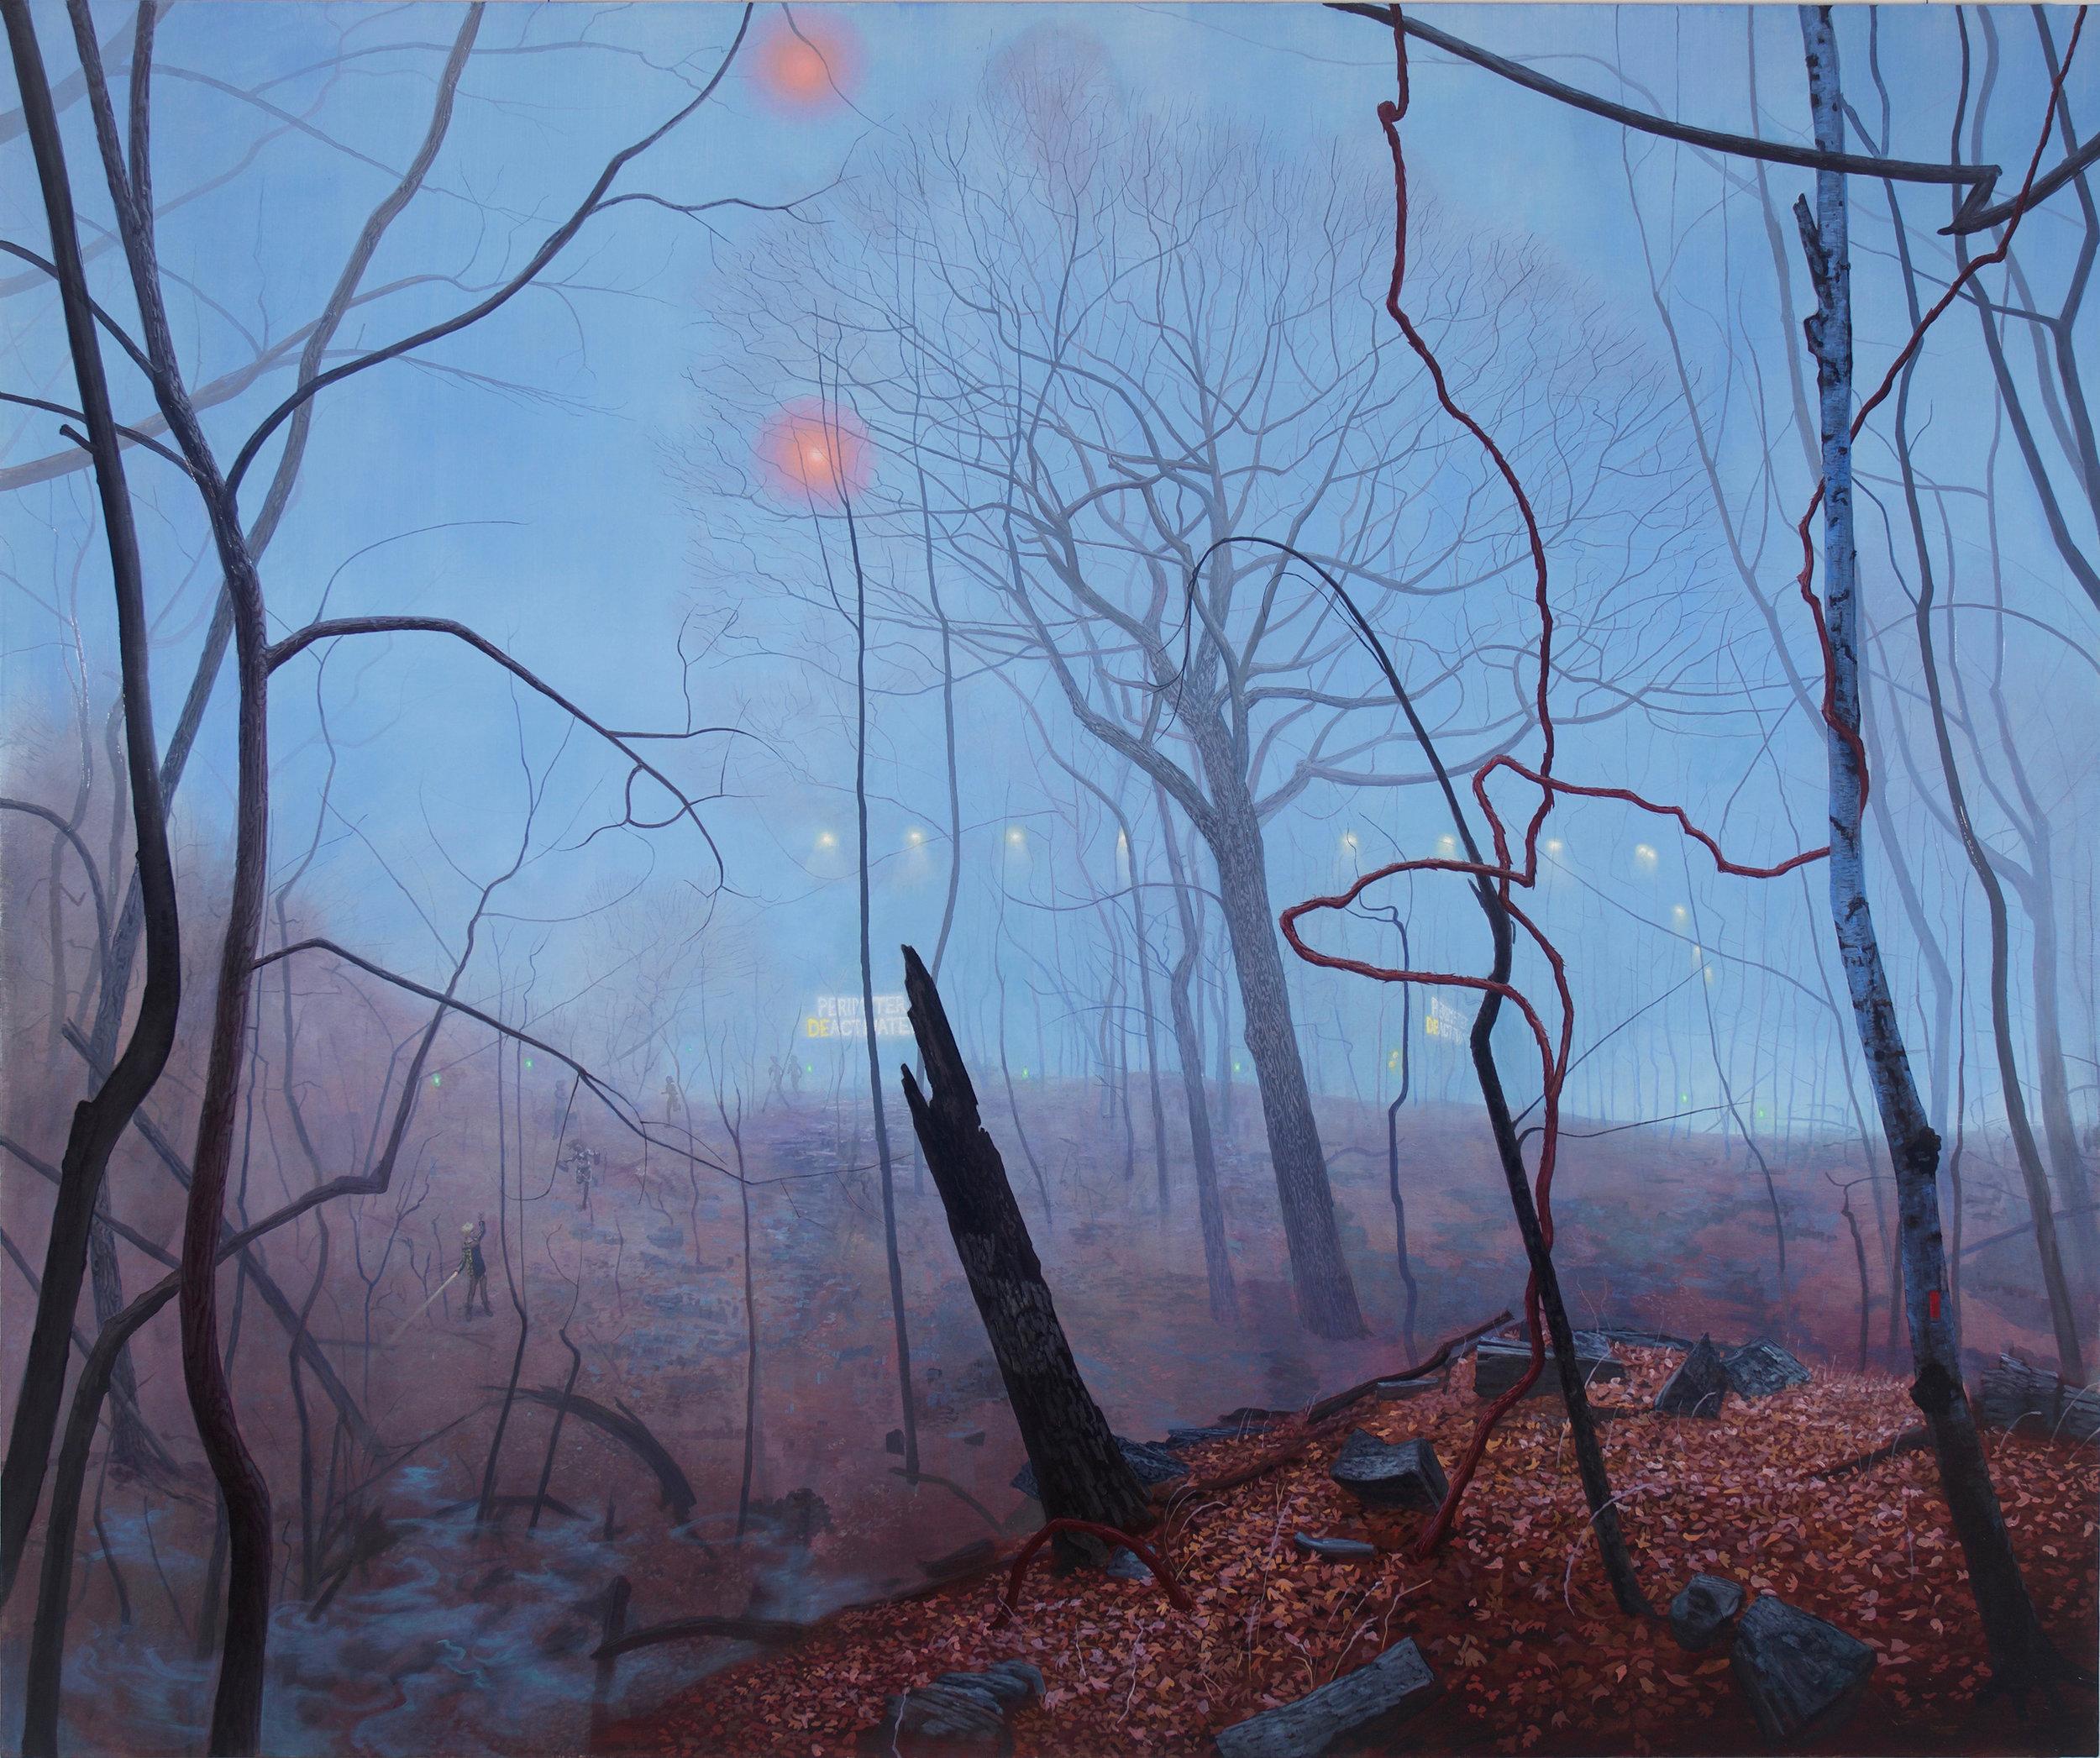 Gallery Poulsen_John Jacobsmeyer_Breach_2019_oil on linen_60 x 72 inches_152 x 183 cm_price on request.jpg